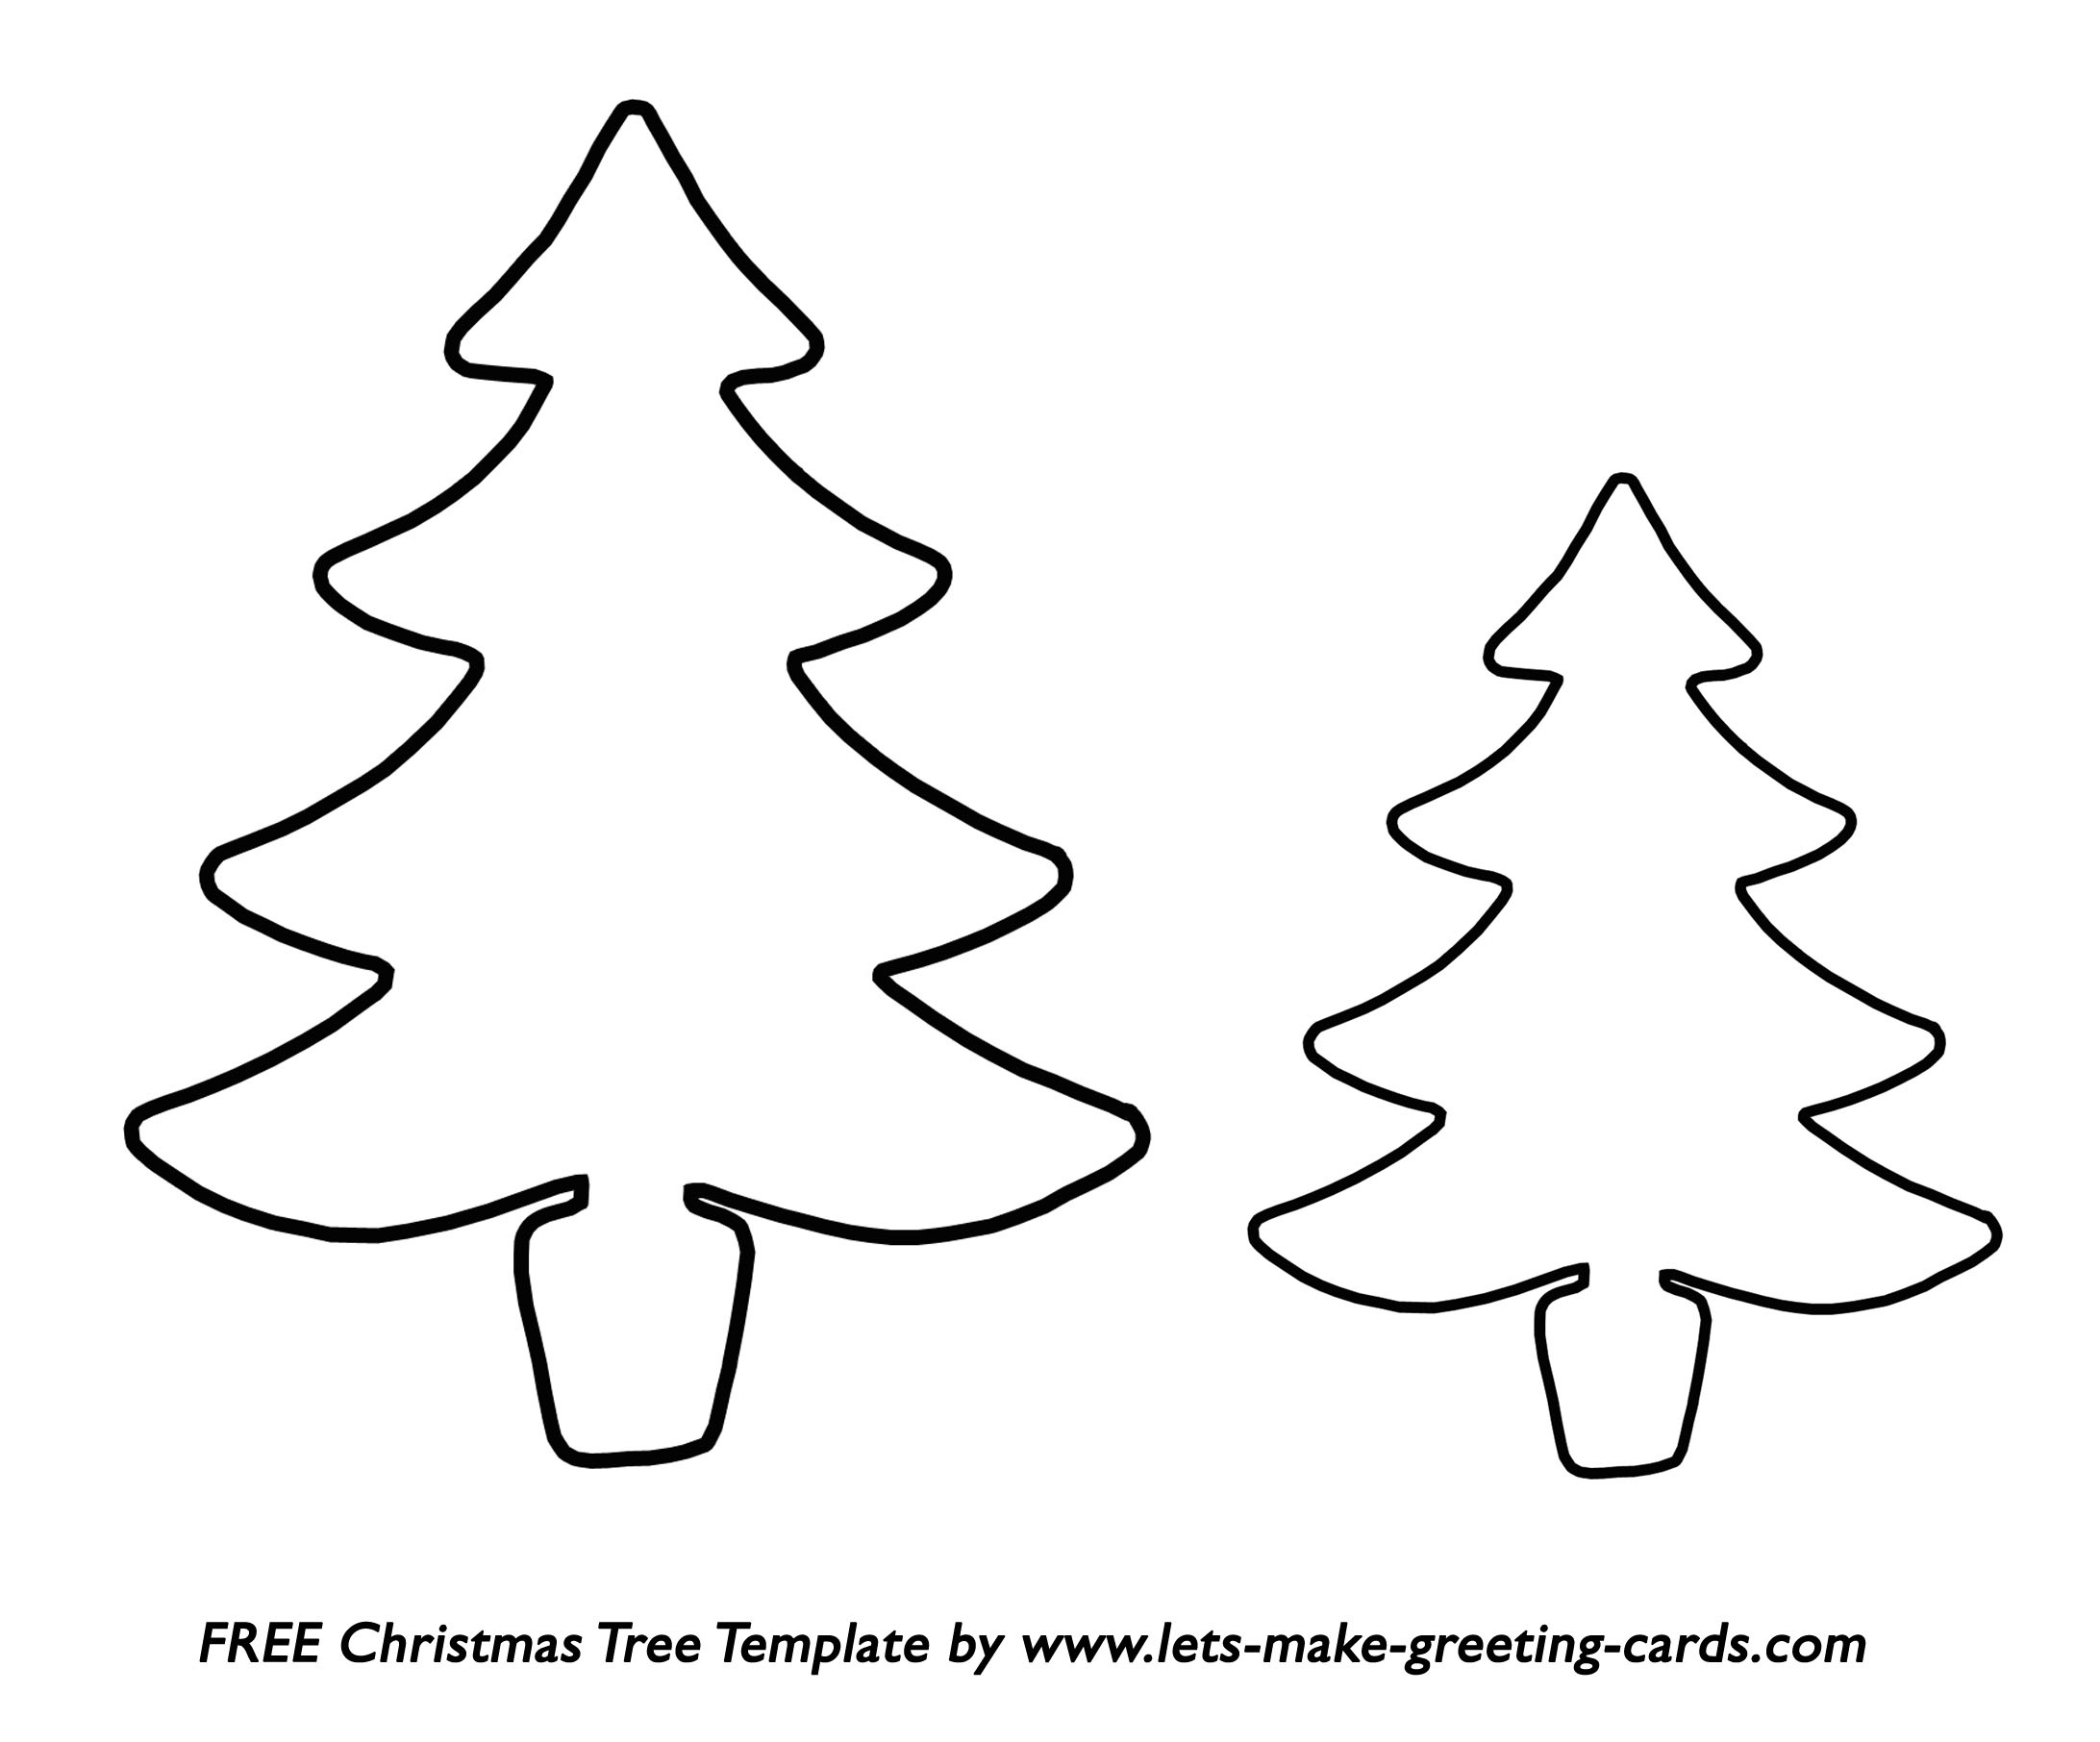 Free Christmas Tree Template. Free Christmas Card Ideas. - Free Printable Christmas Tree Template